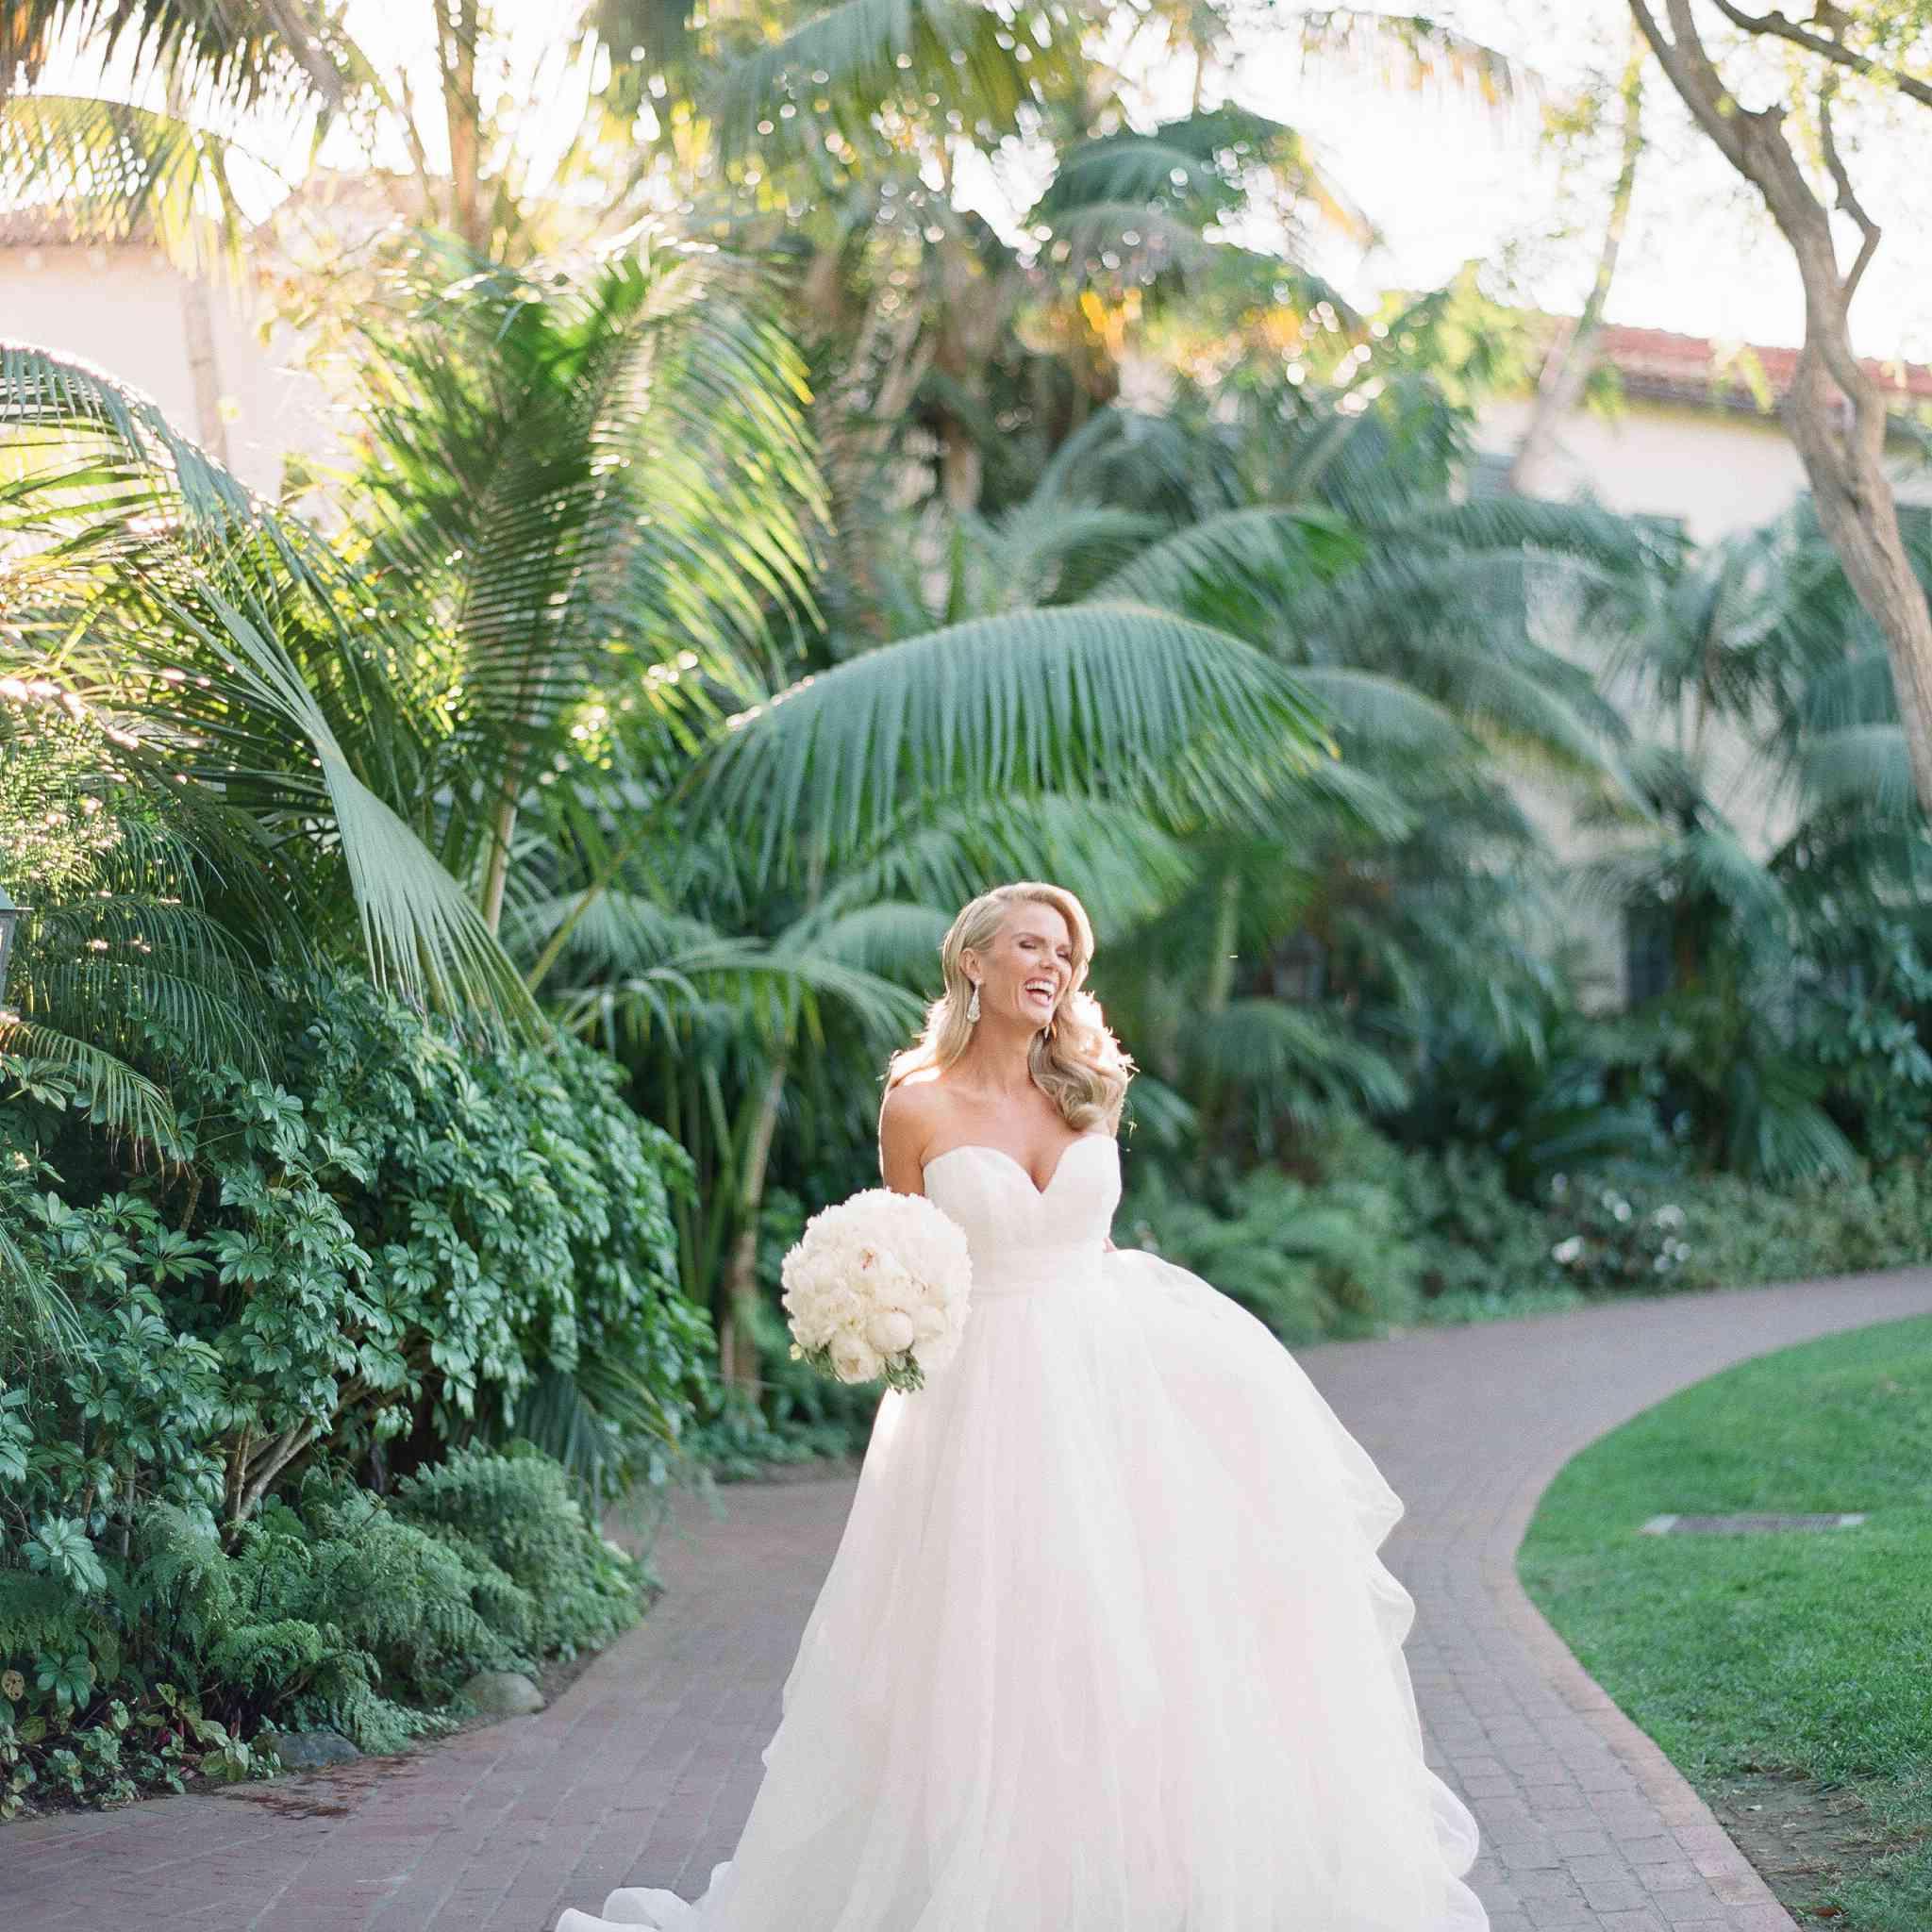 bride in timeless dress